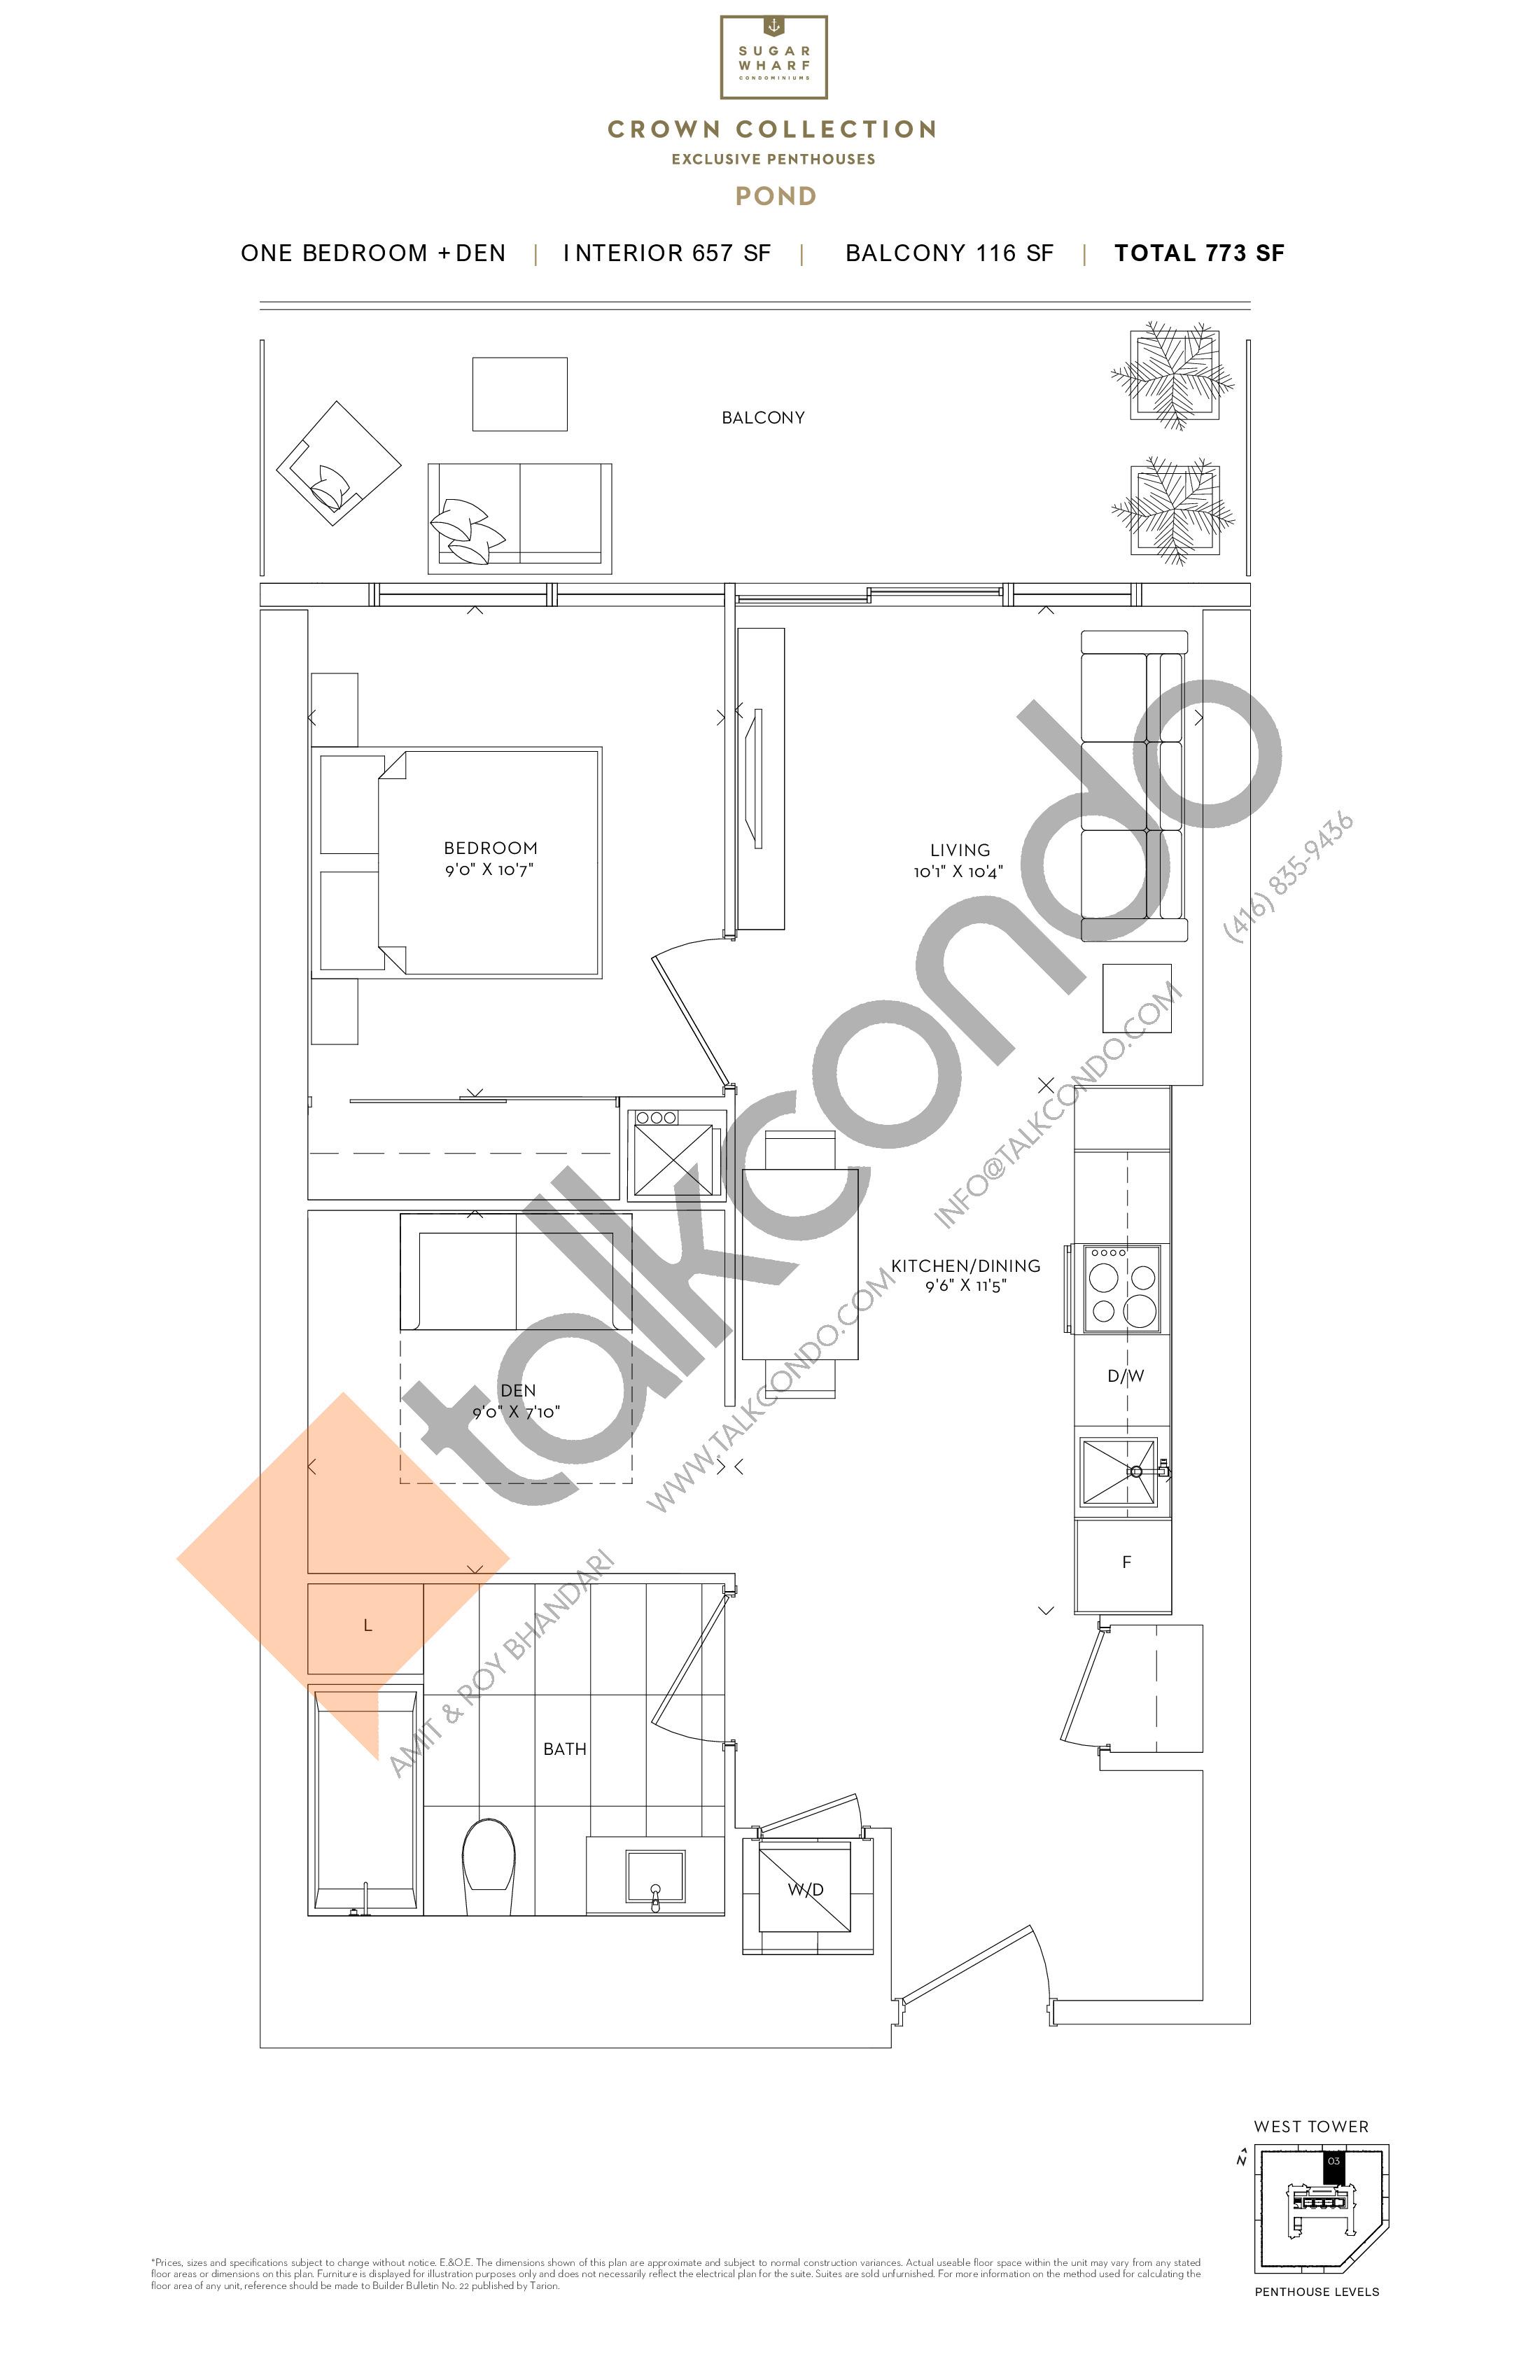 Pond Floor Plan at Sugar Wharf Condos West Tower - 657 sq.ft